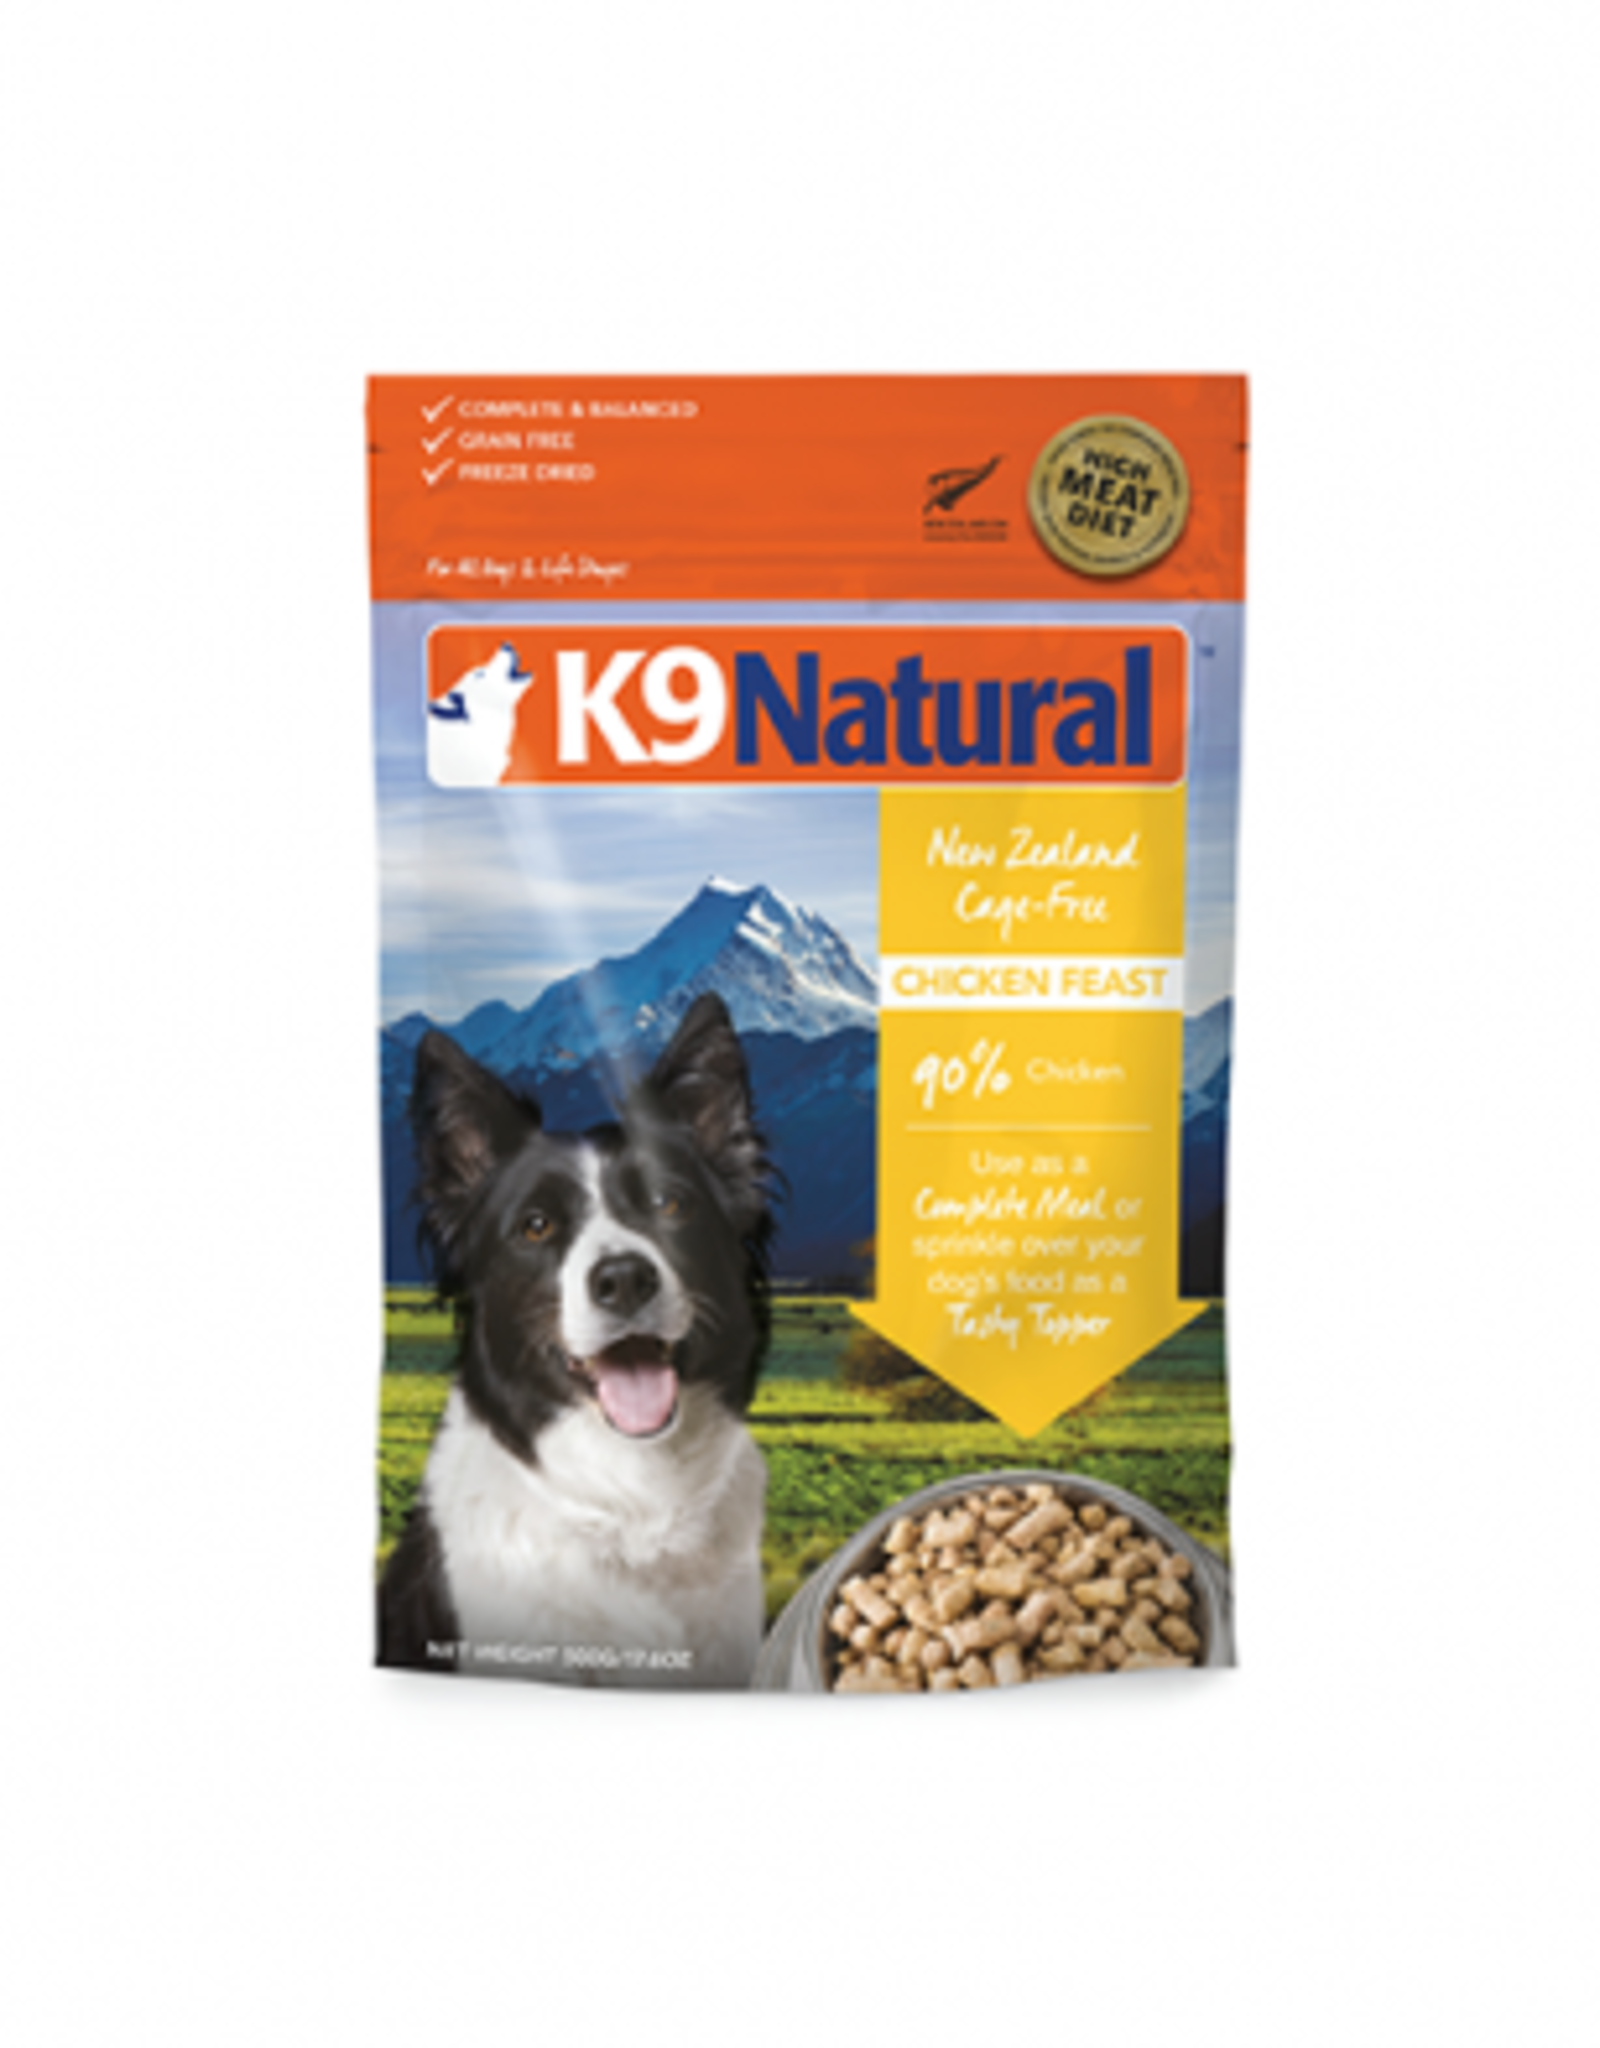 k9 Natural k9 naturals chicken 500g